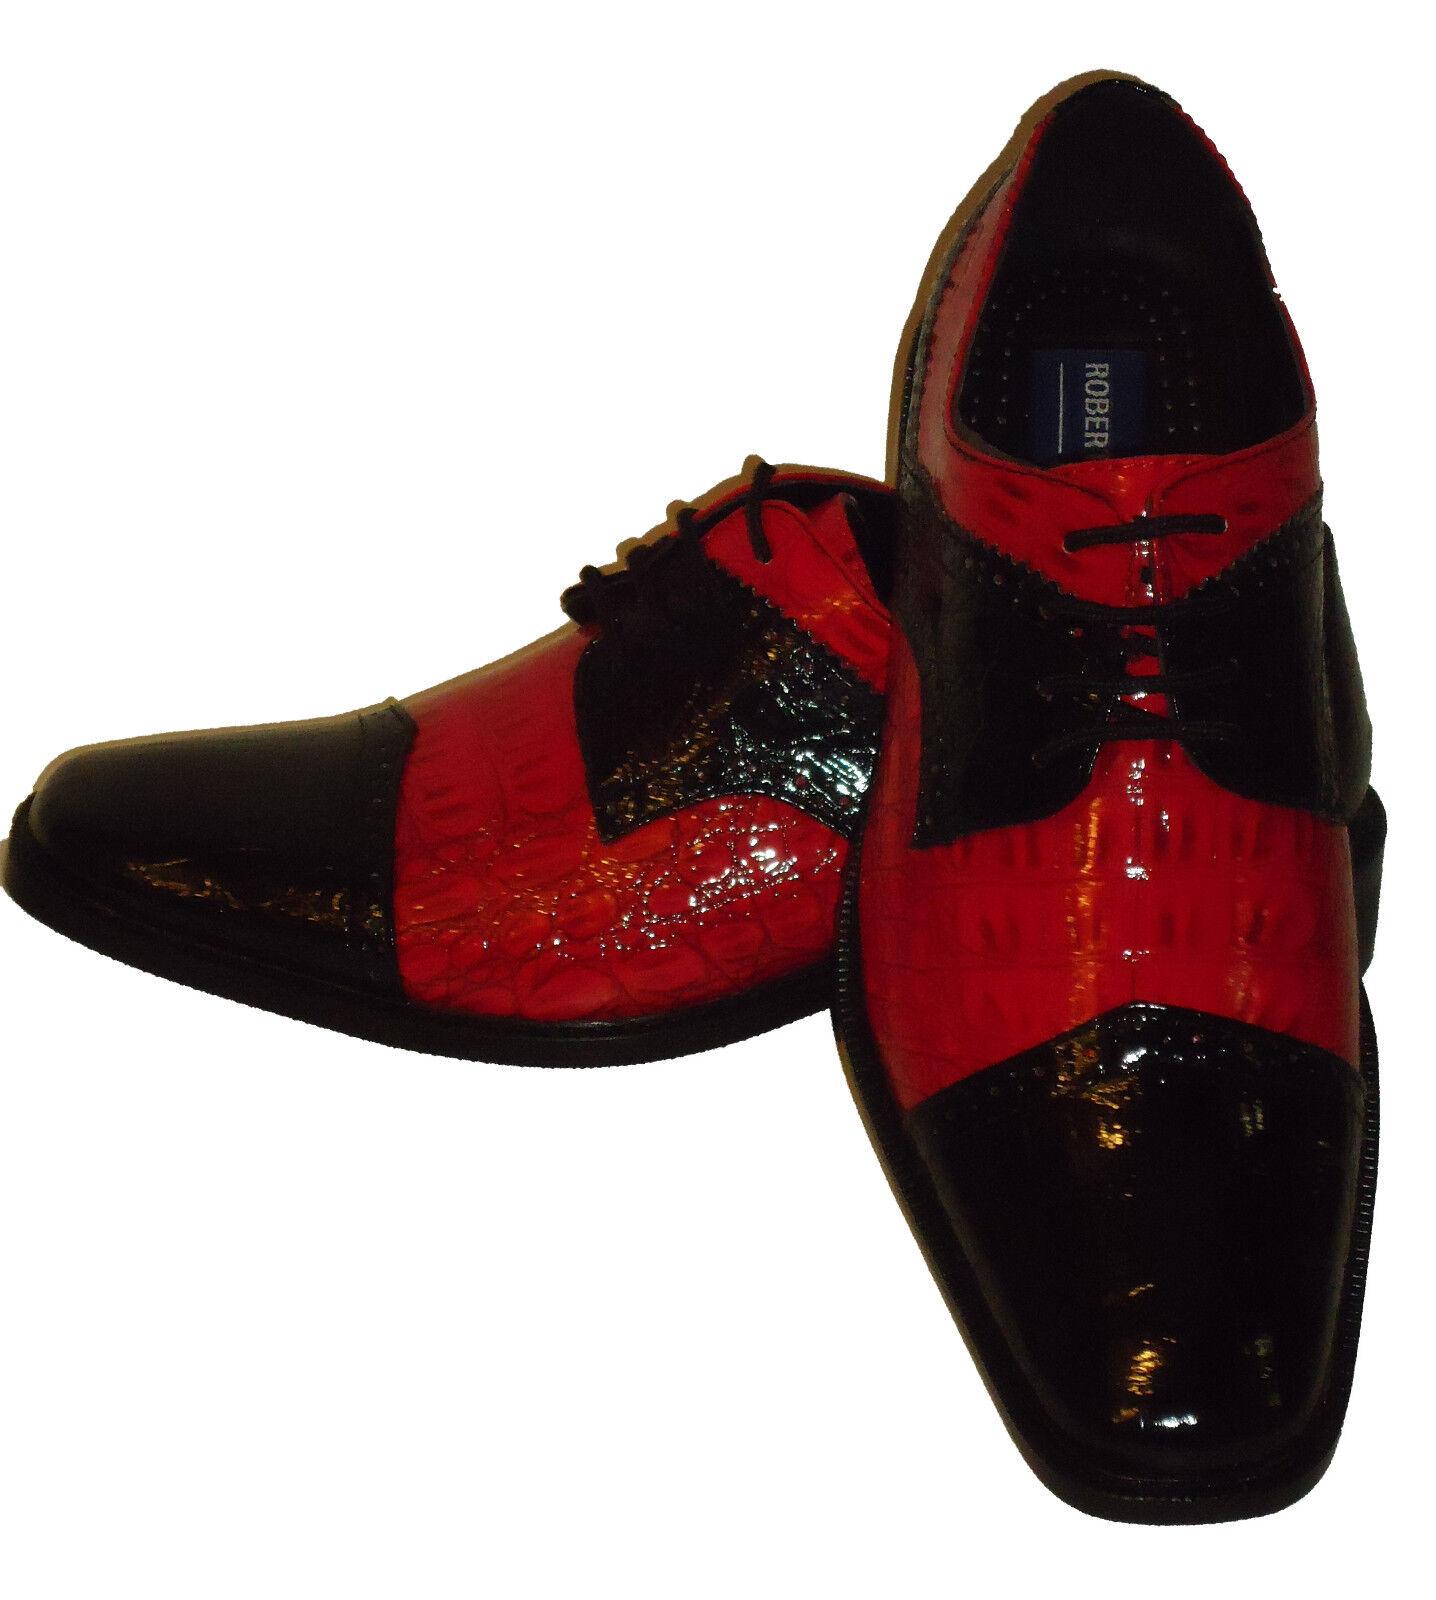 Roberto Chillini Spectator 6744 Mens Wing Tip Spectator Chillini Dress Shoes Glossy Red + Black 6d8e5f